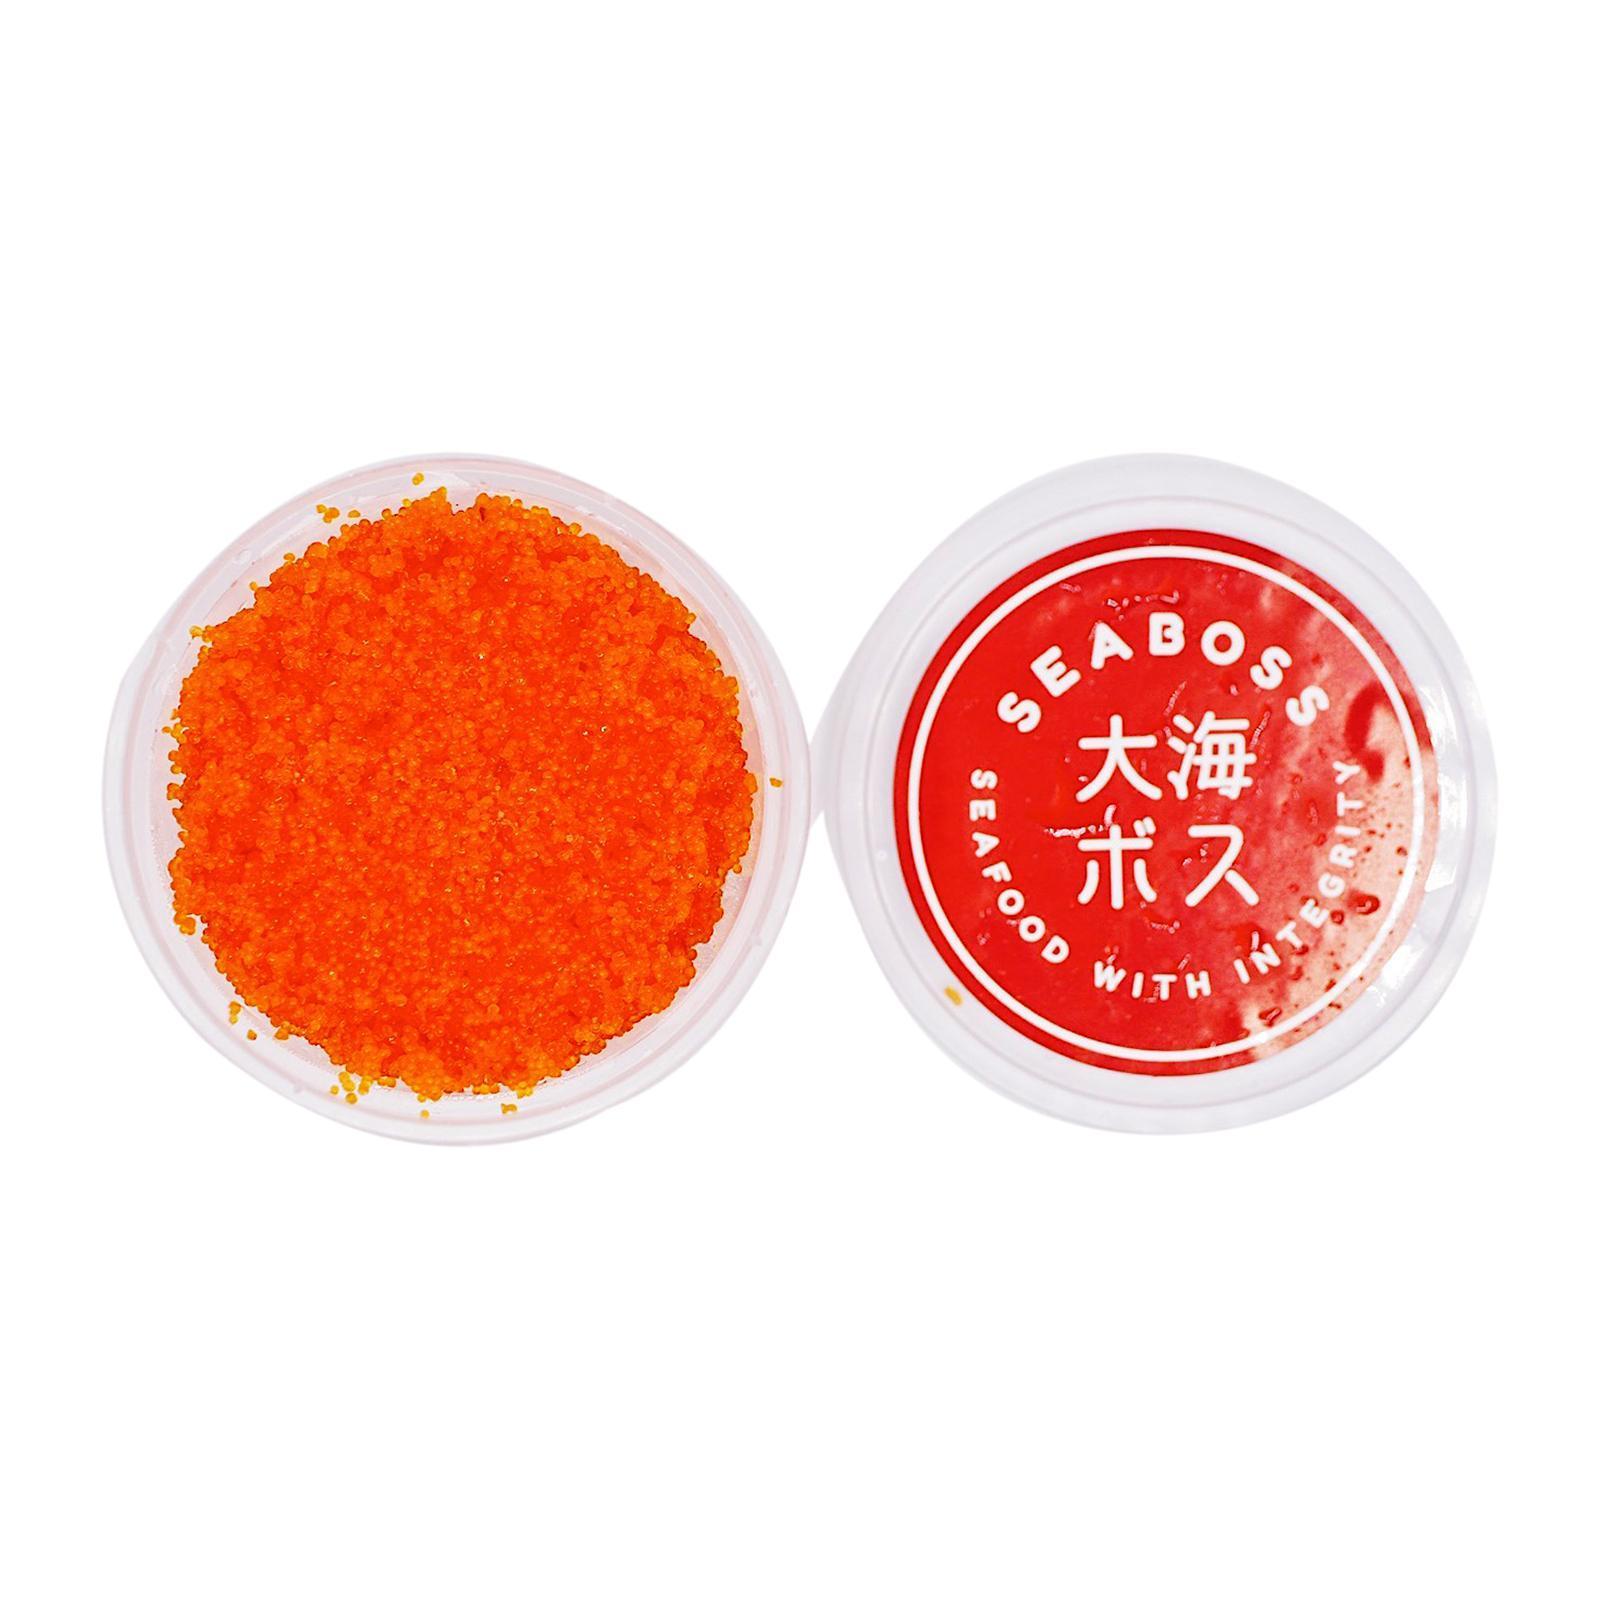 SEABOSS Ebiko (Sashimi-gradeShrimpRoe) - Frozen